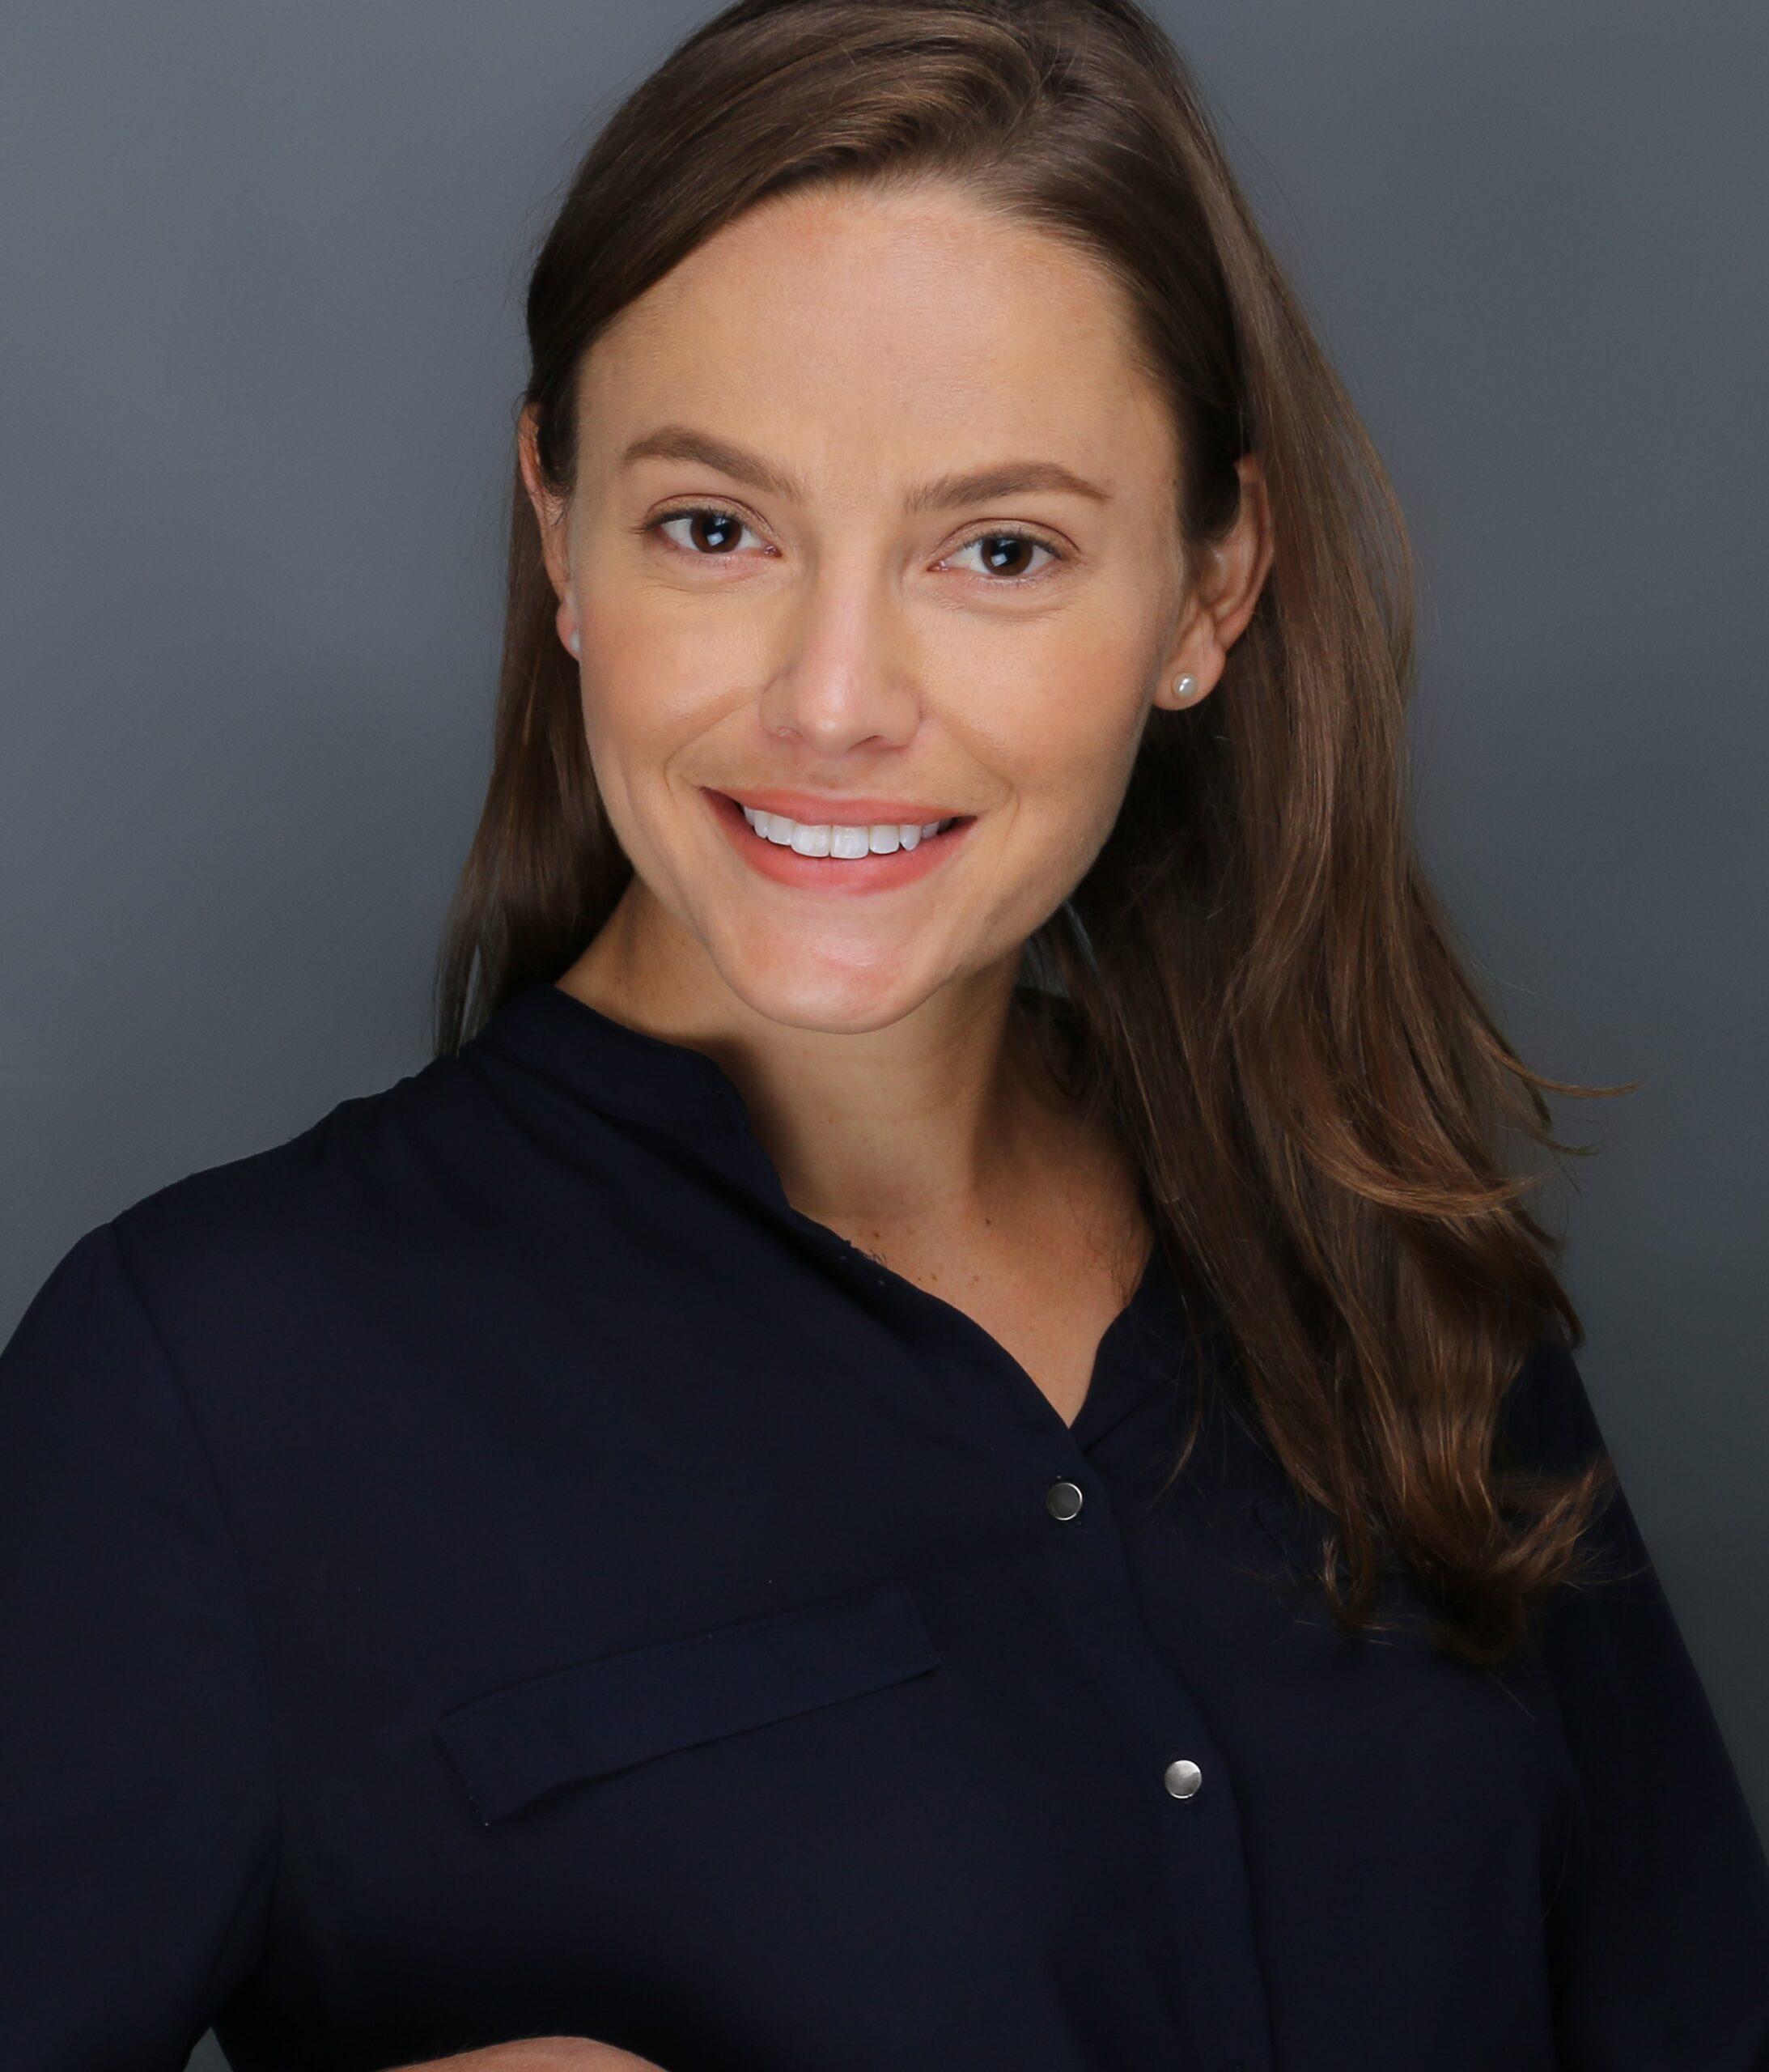 Dr. Kimberley Craig